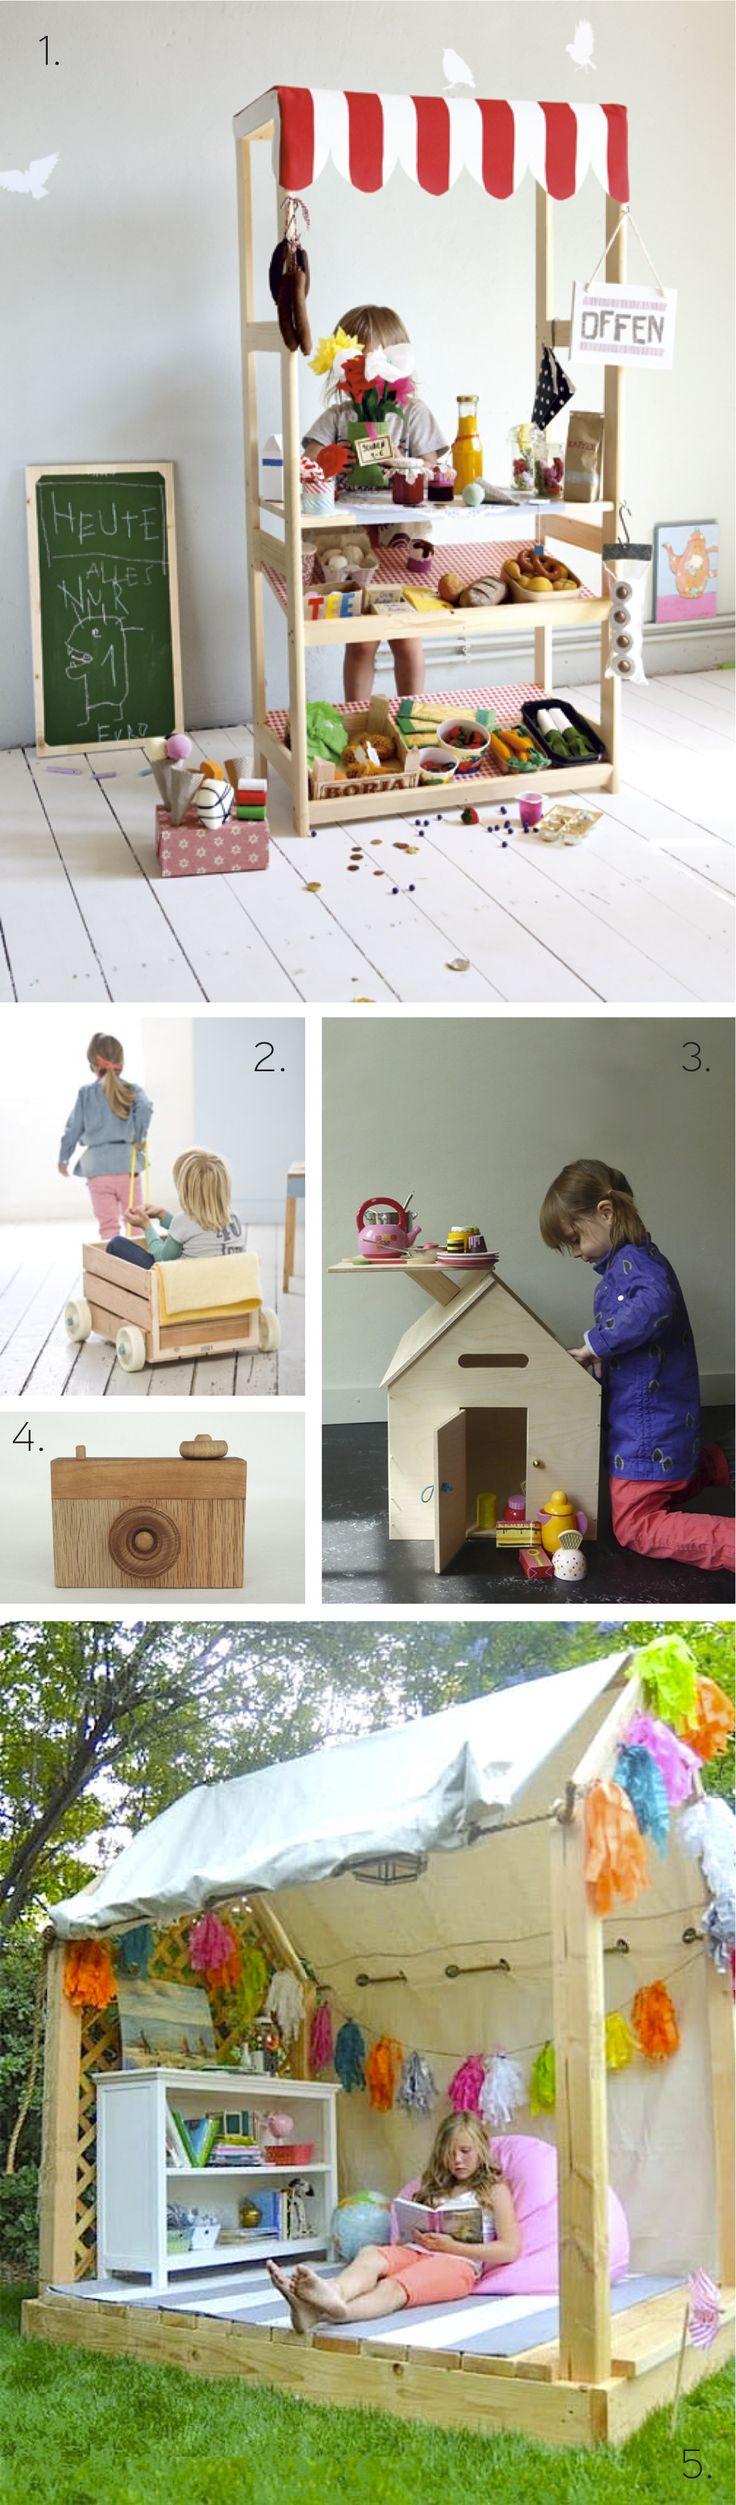 760 best Stuff to do for my Little Girl images on Pinterest | Doll ...